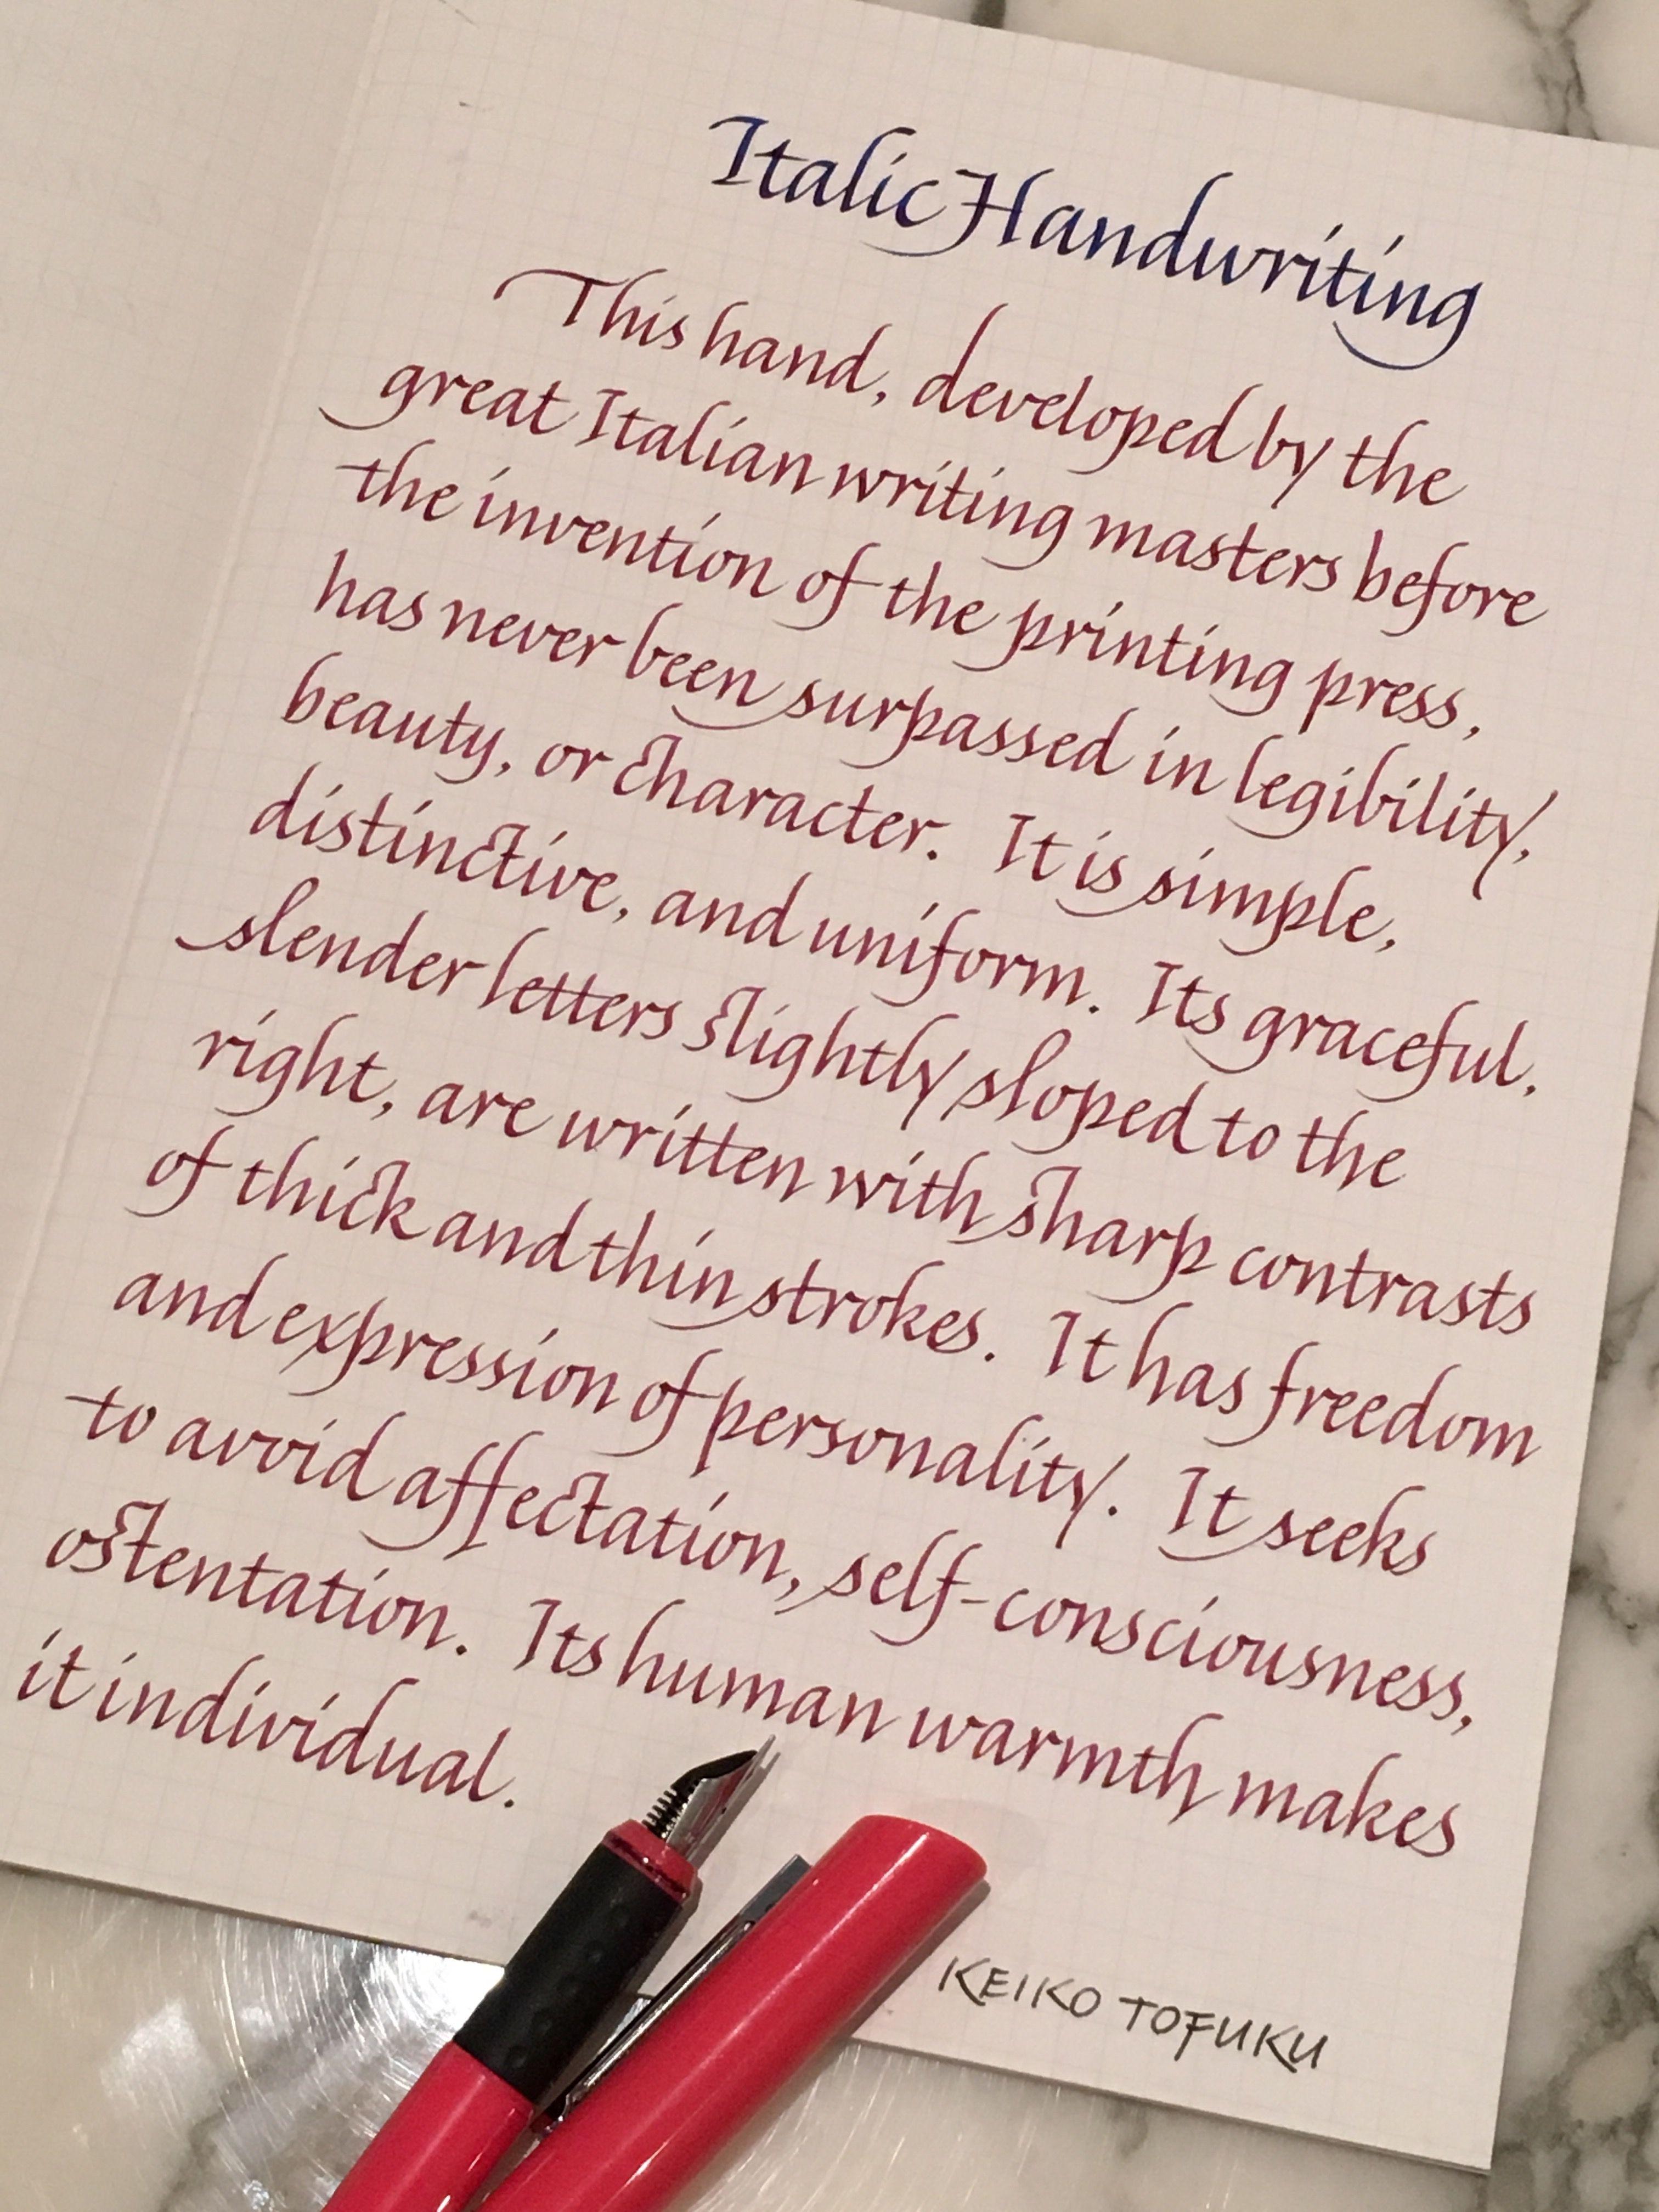 About Italic Handwriting